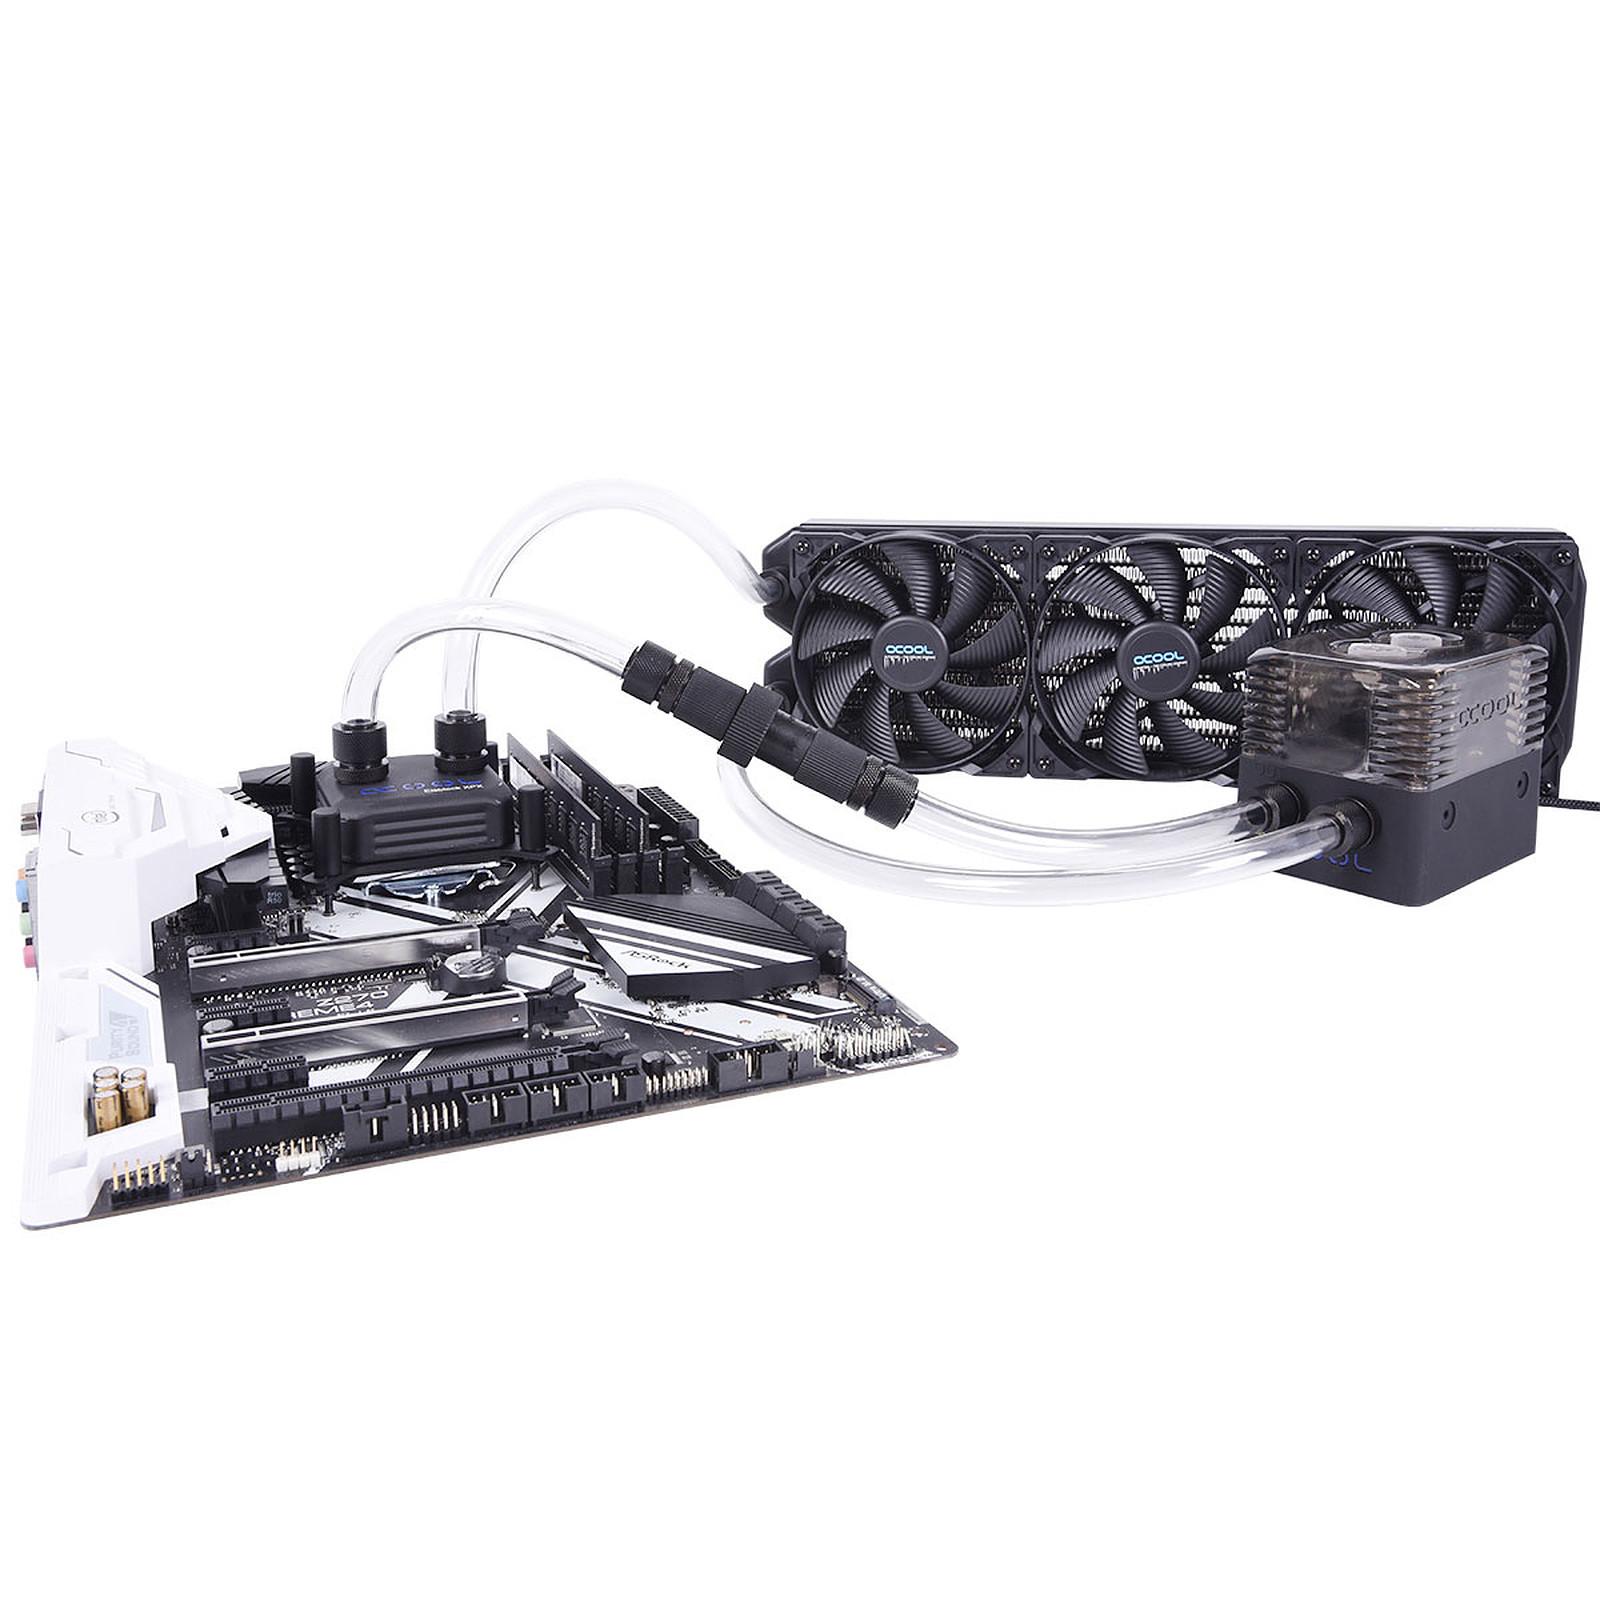 Alphacool Eissturm Gaming Copper 30 3x120mm